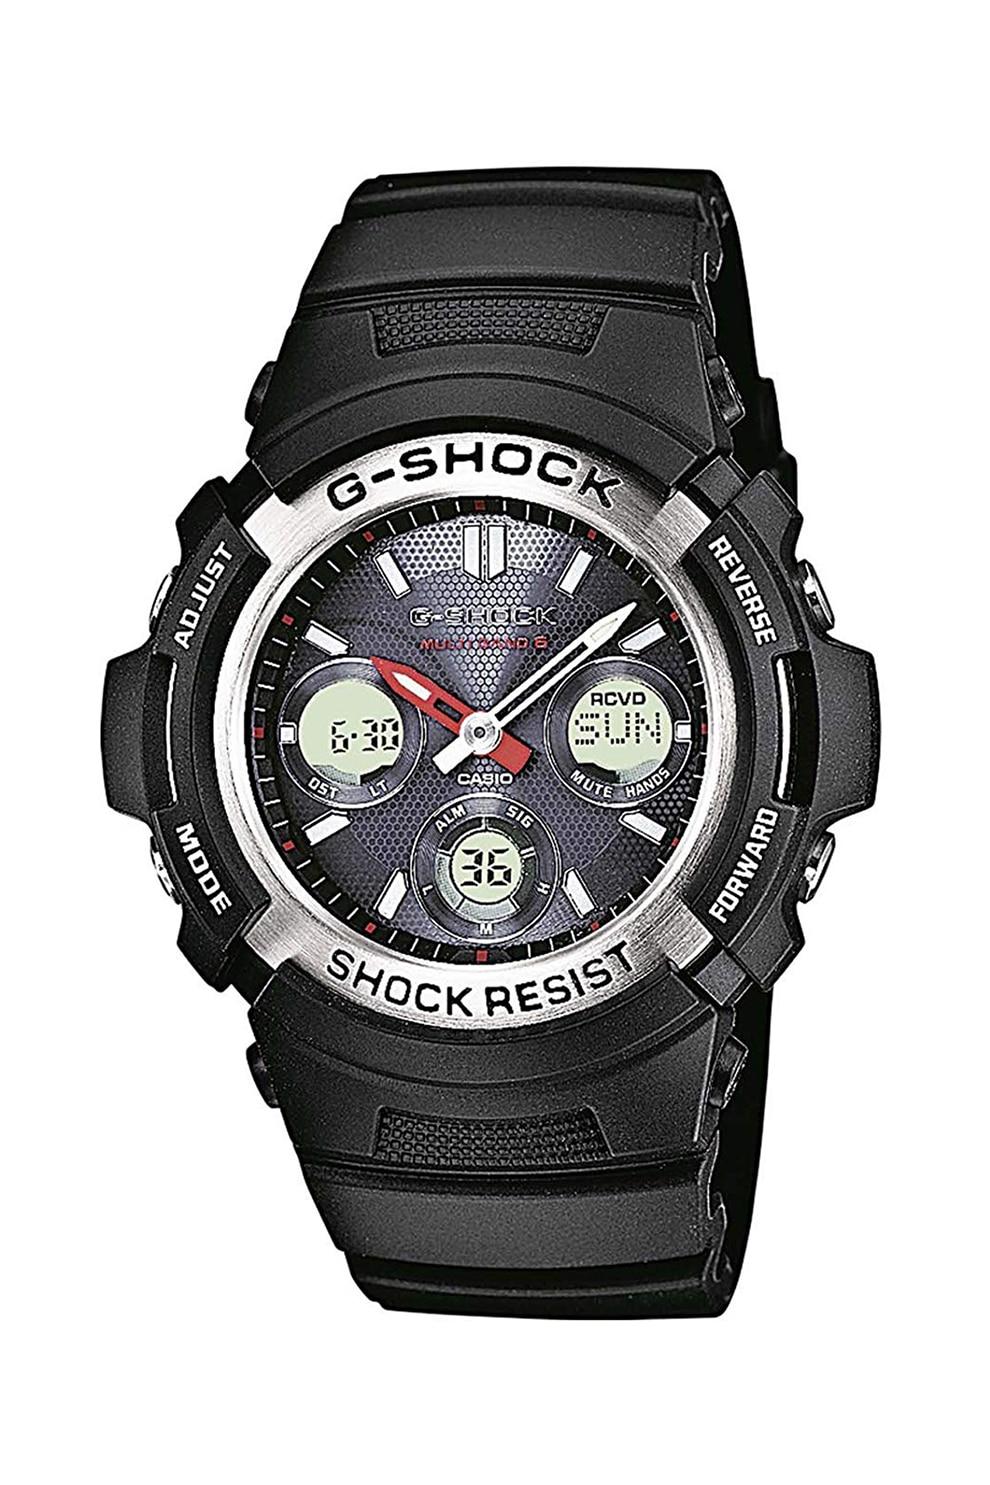 Fotografie Casio, Ceas digital G-Shock Resistant, Negru